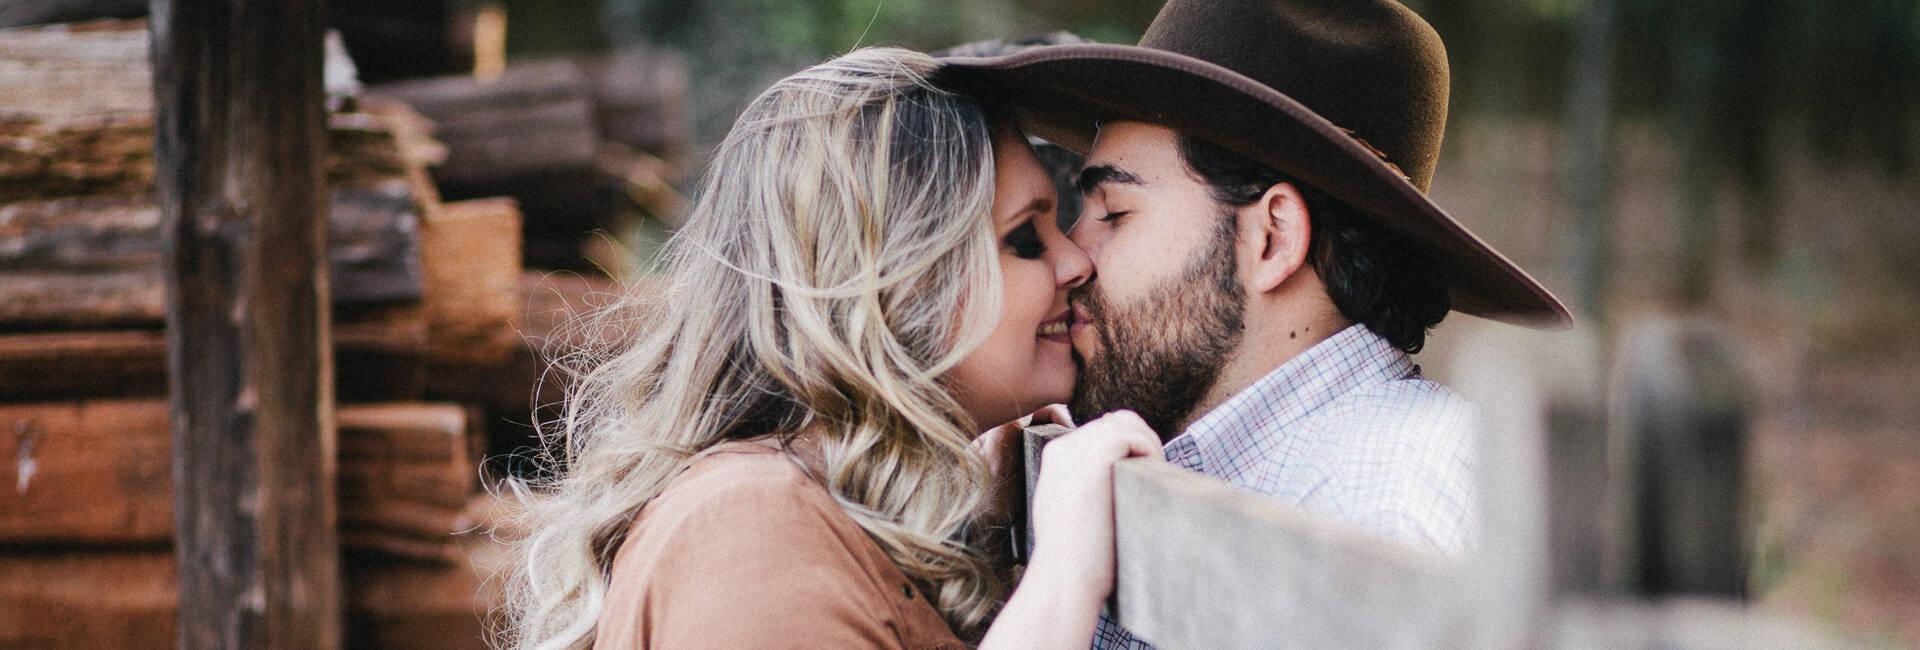 Pré-Casamento de Isa & Raul